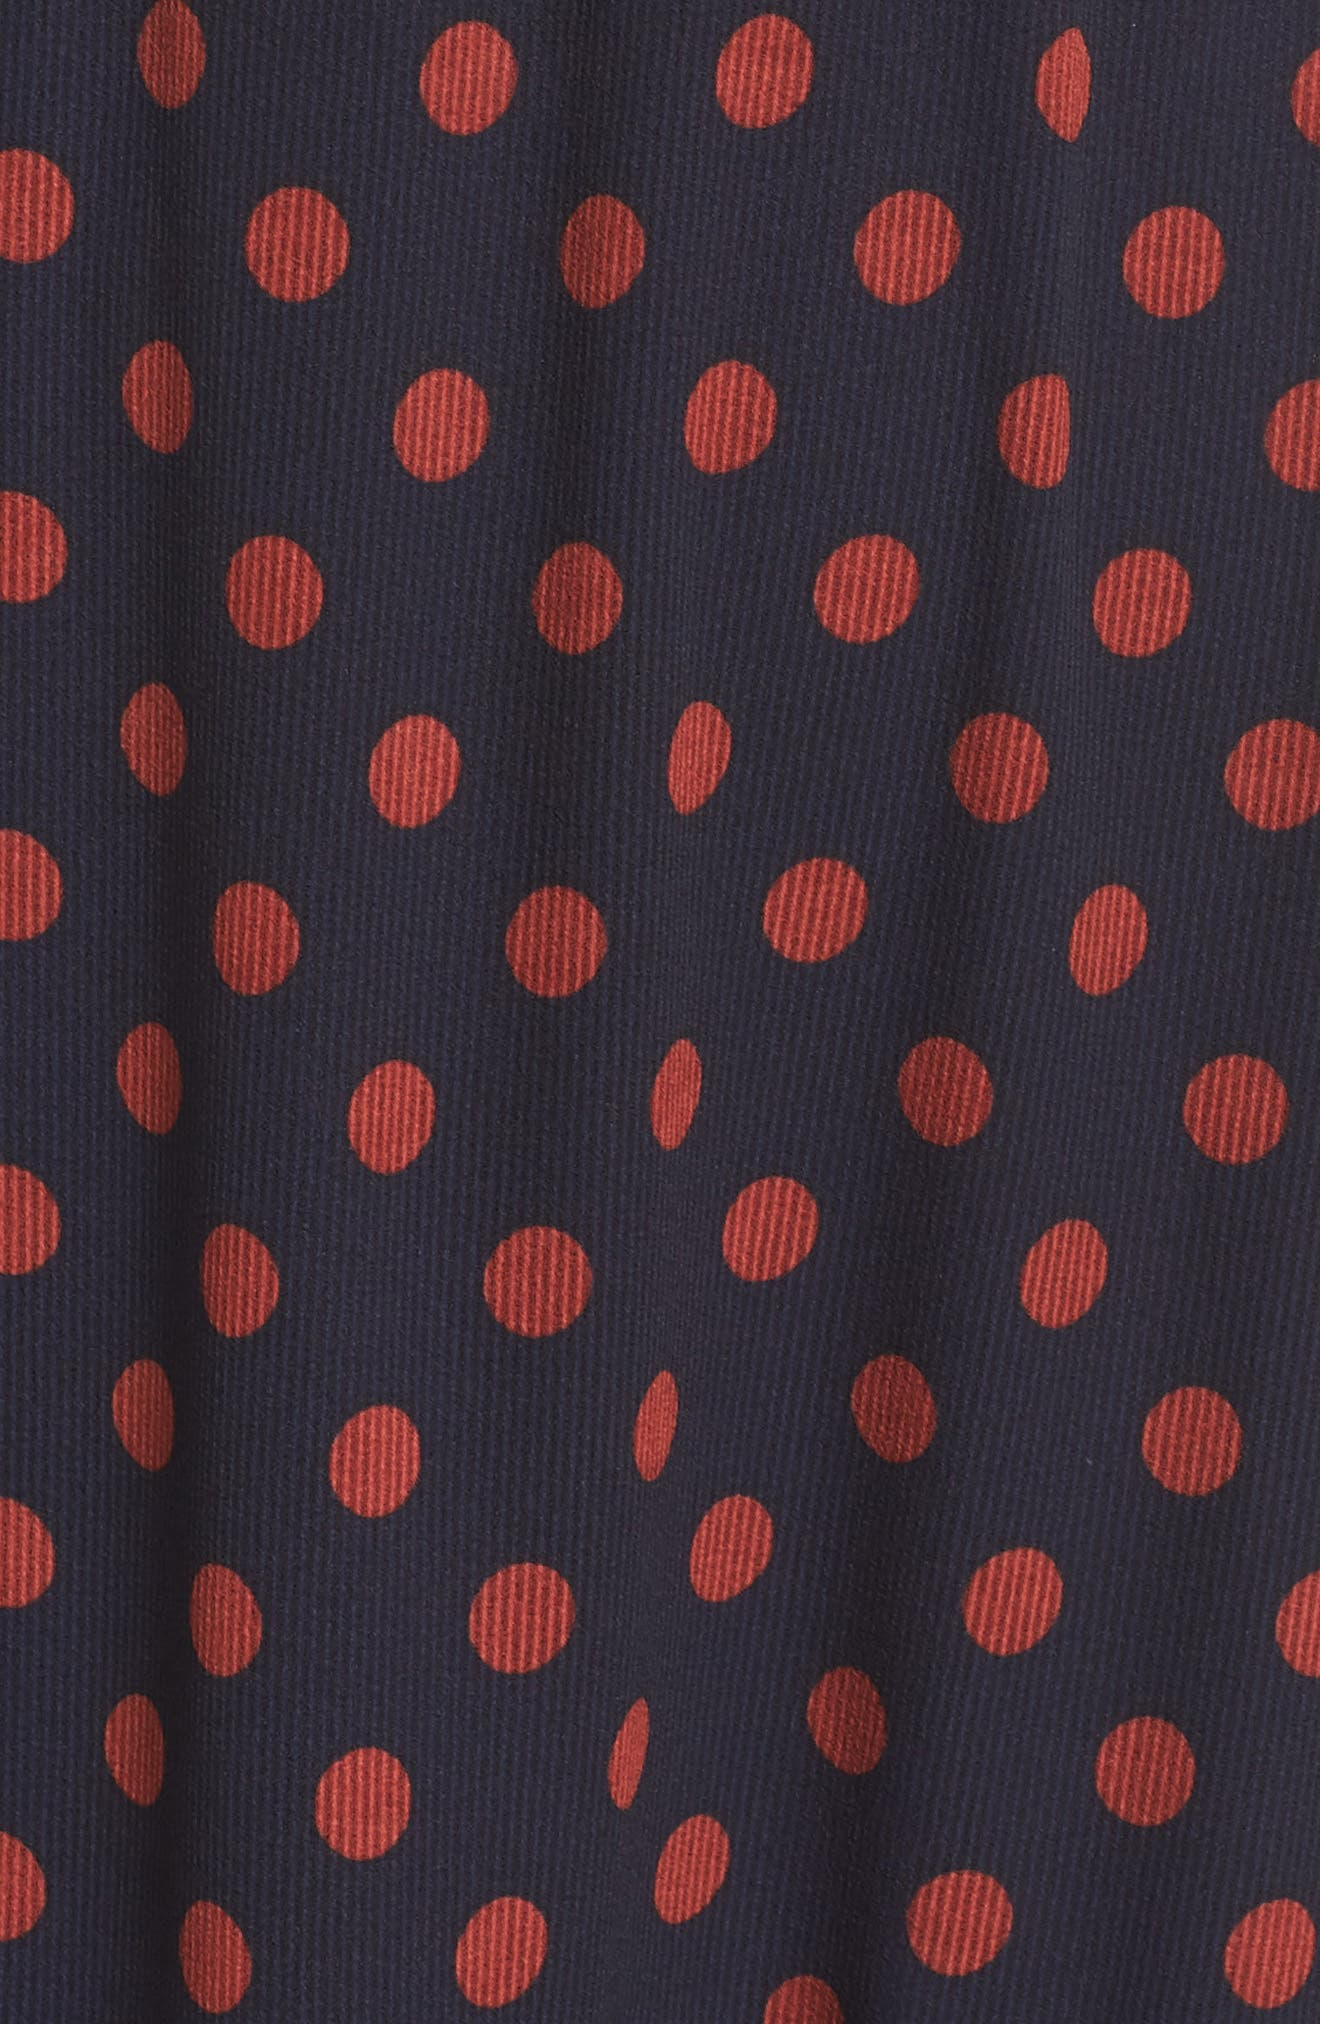 Dot Ruffle Maxi Dress,                             Alternate thumbnail 5, color,                             419